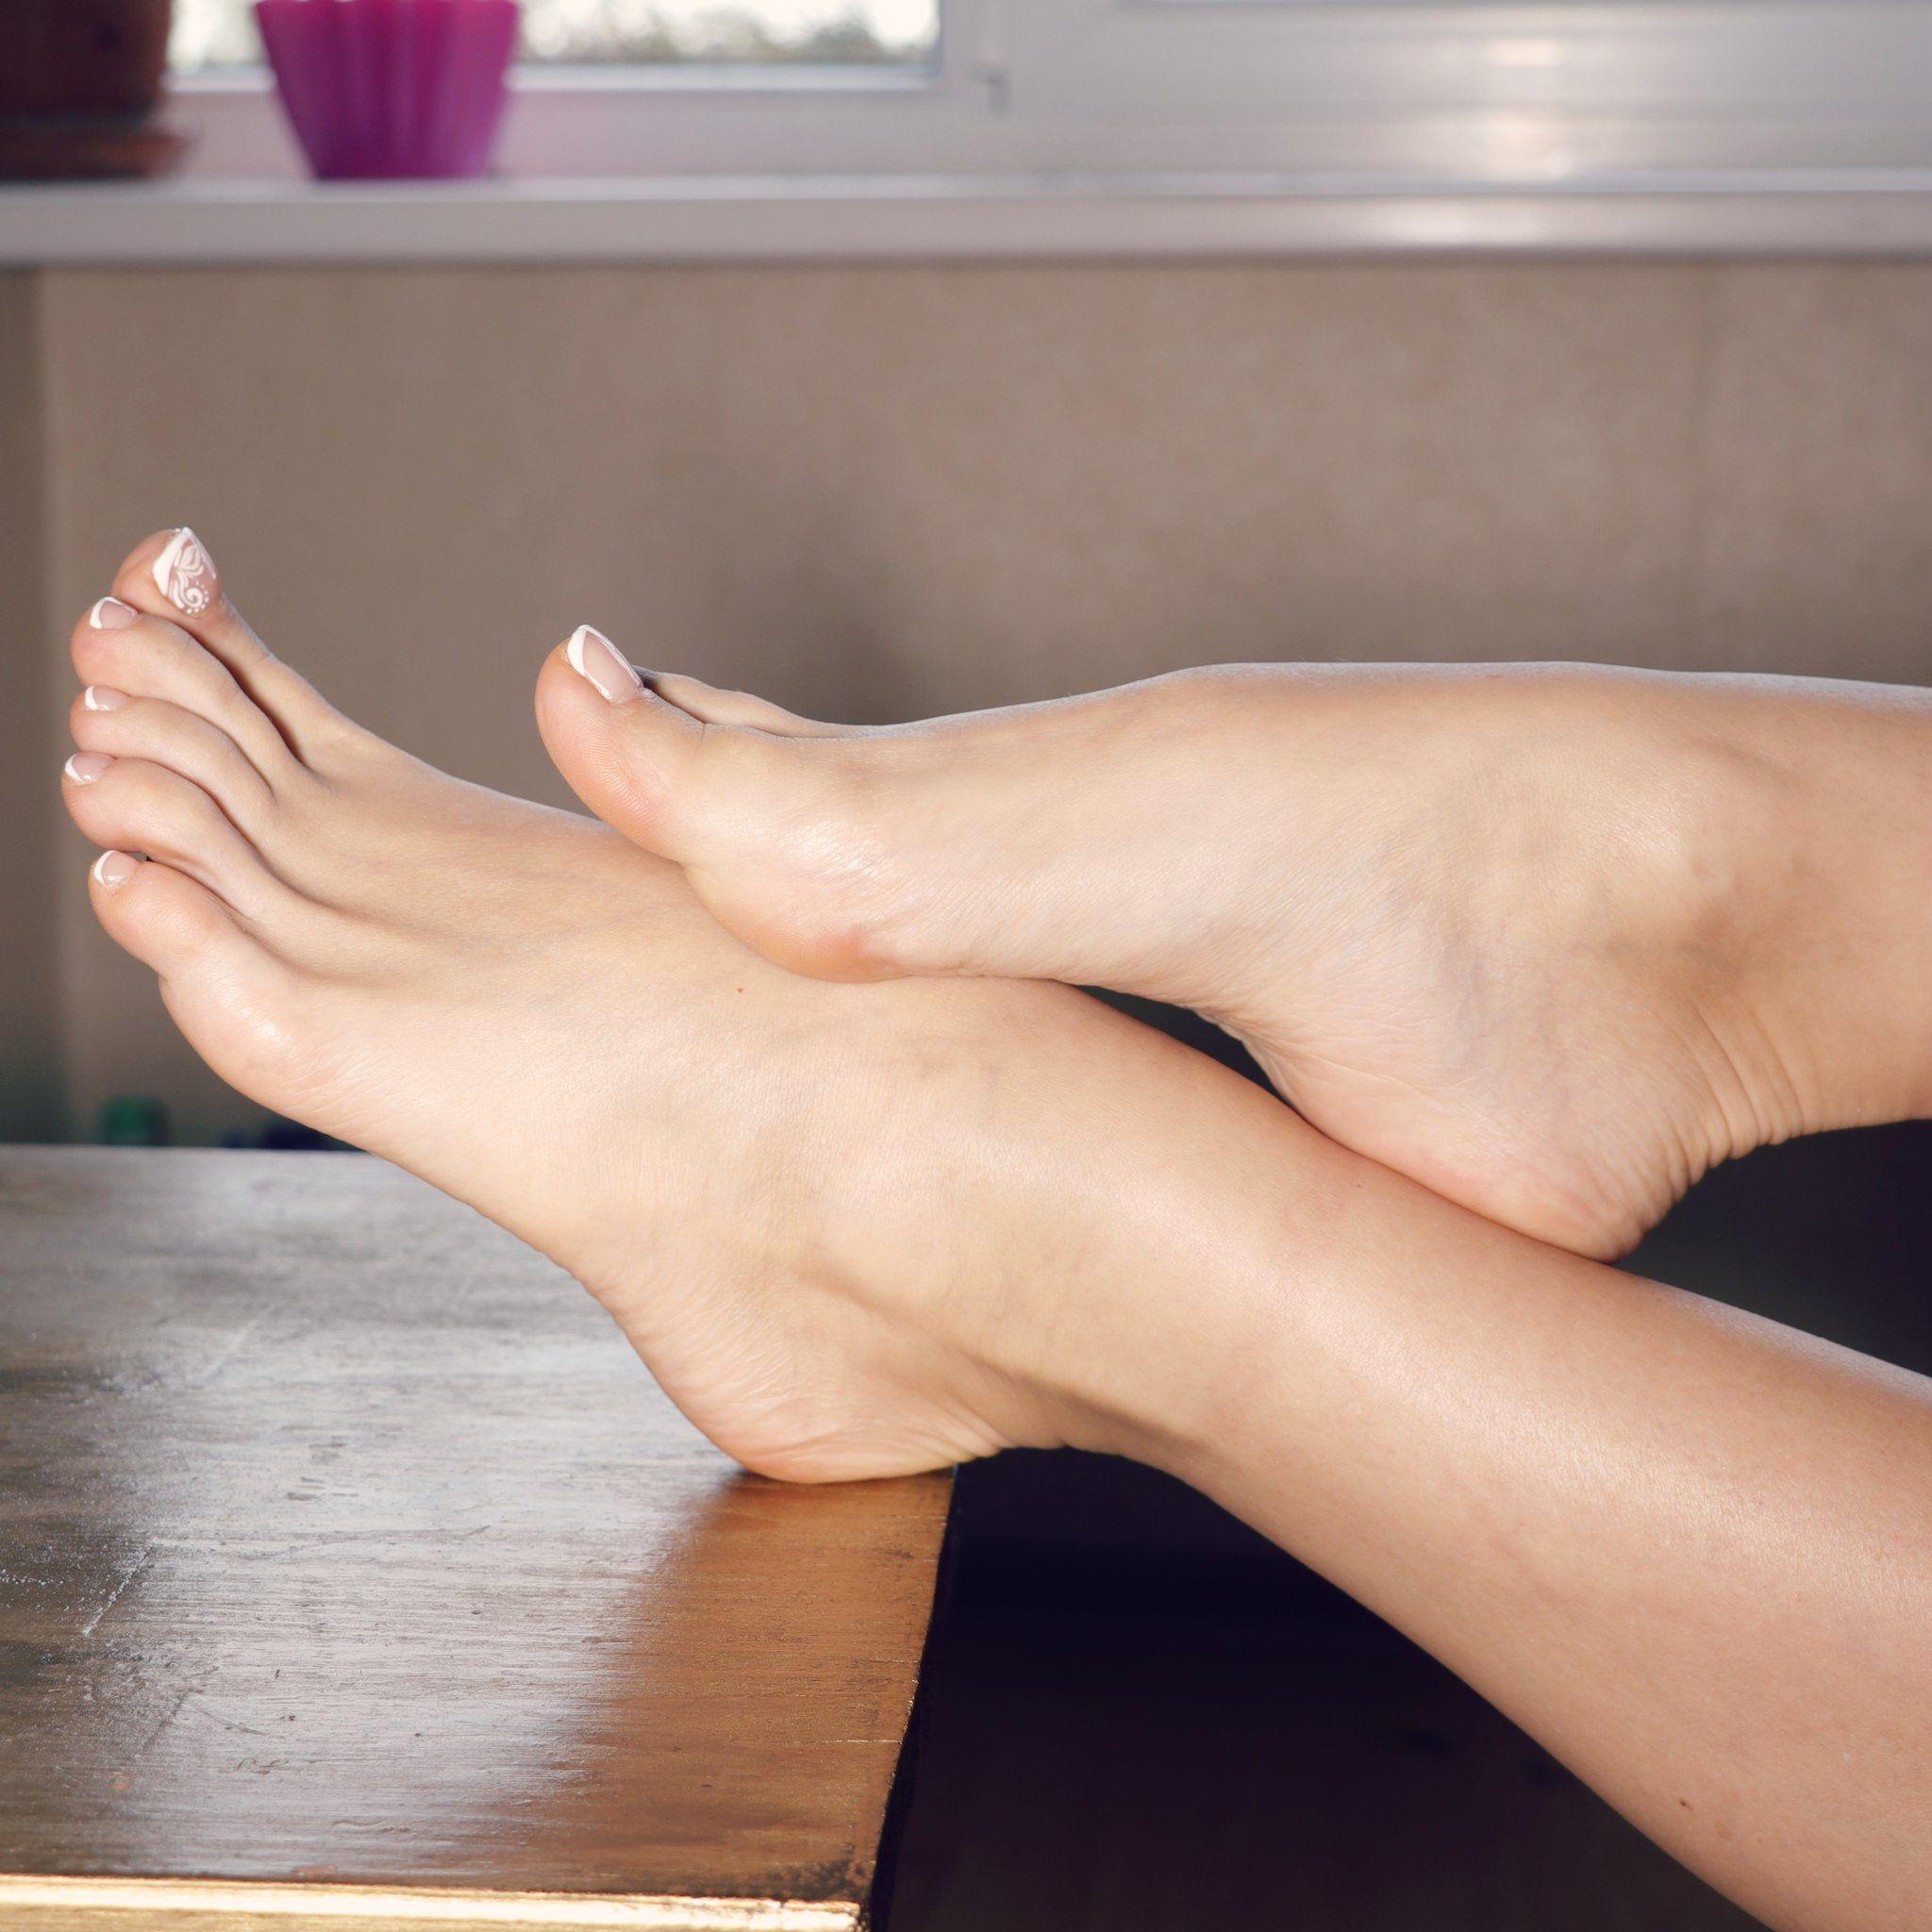 Woman's feet sexy image photo